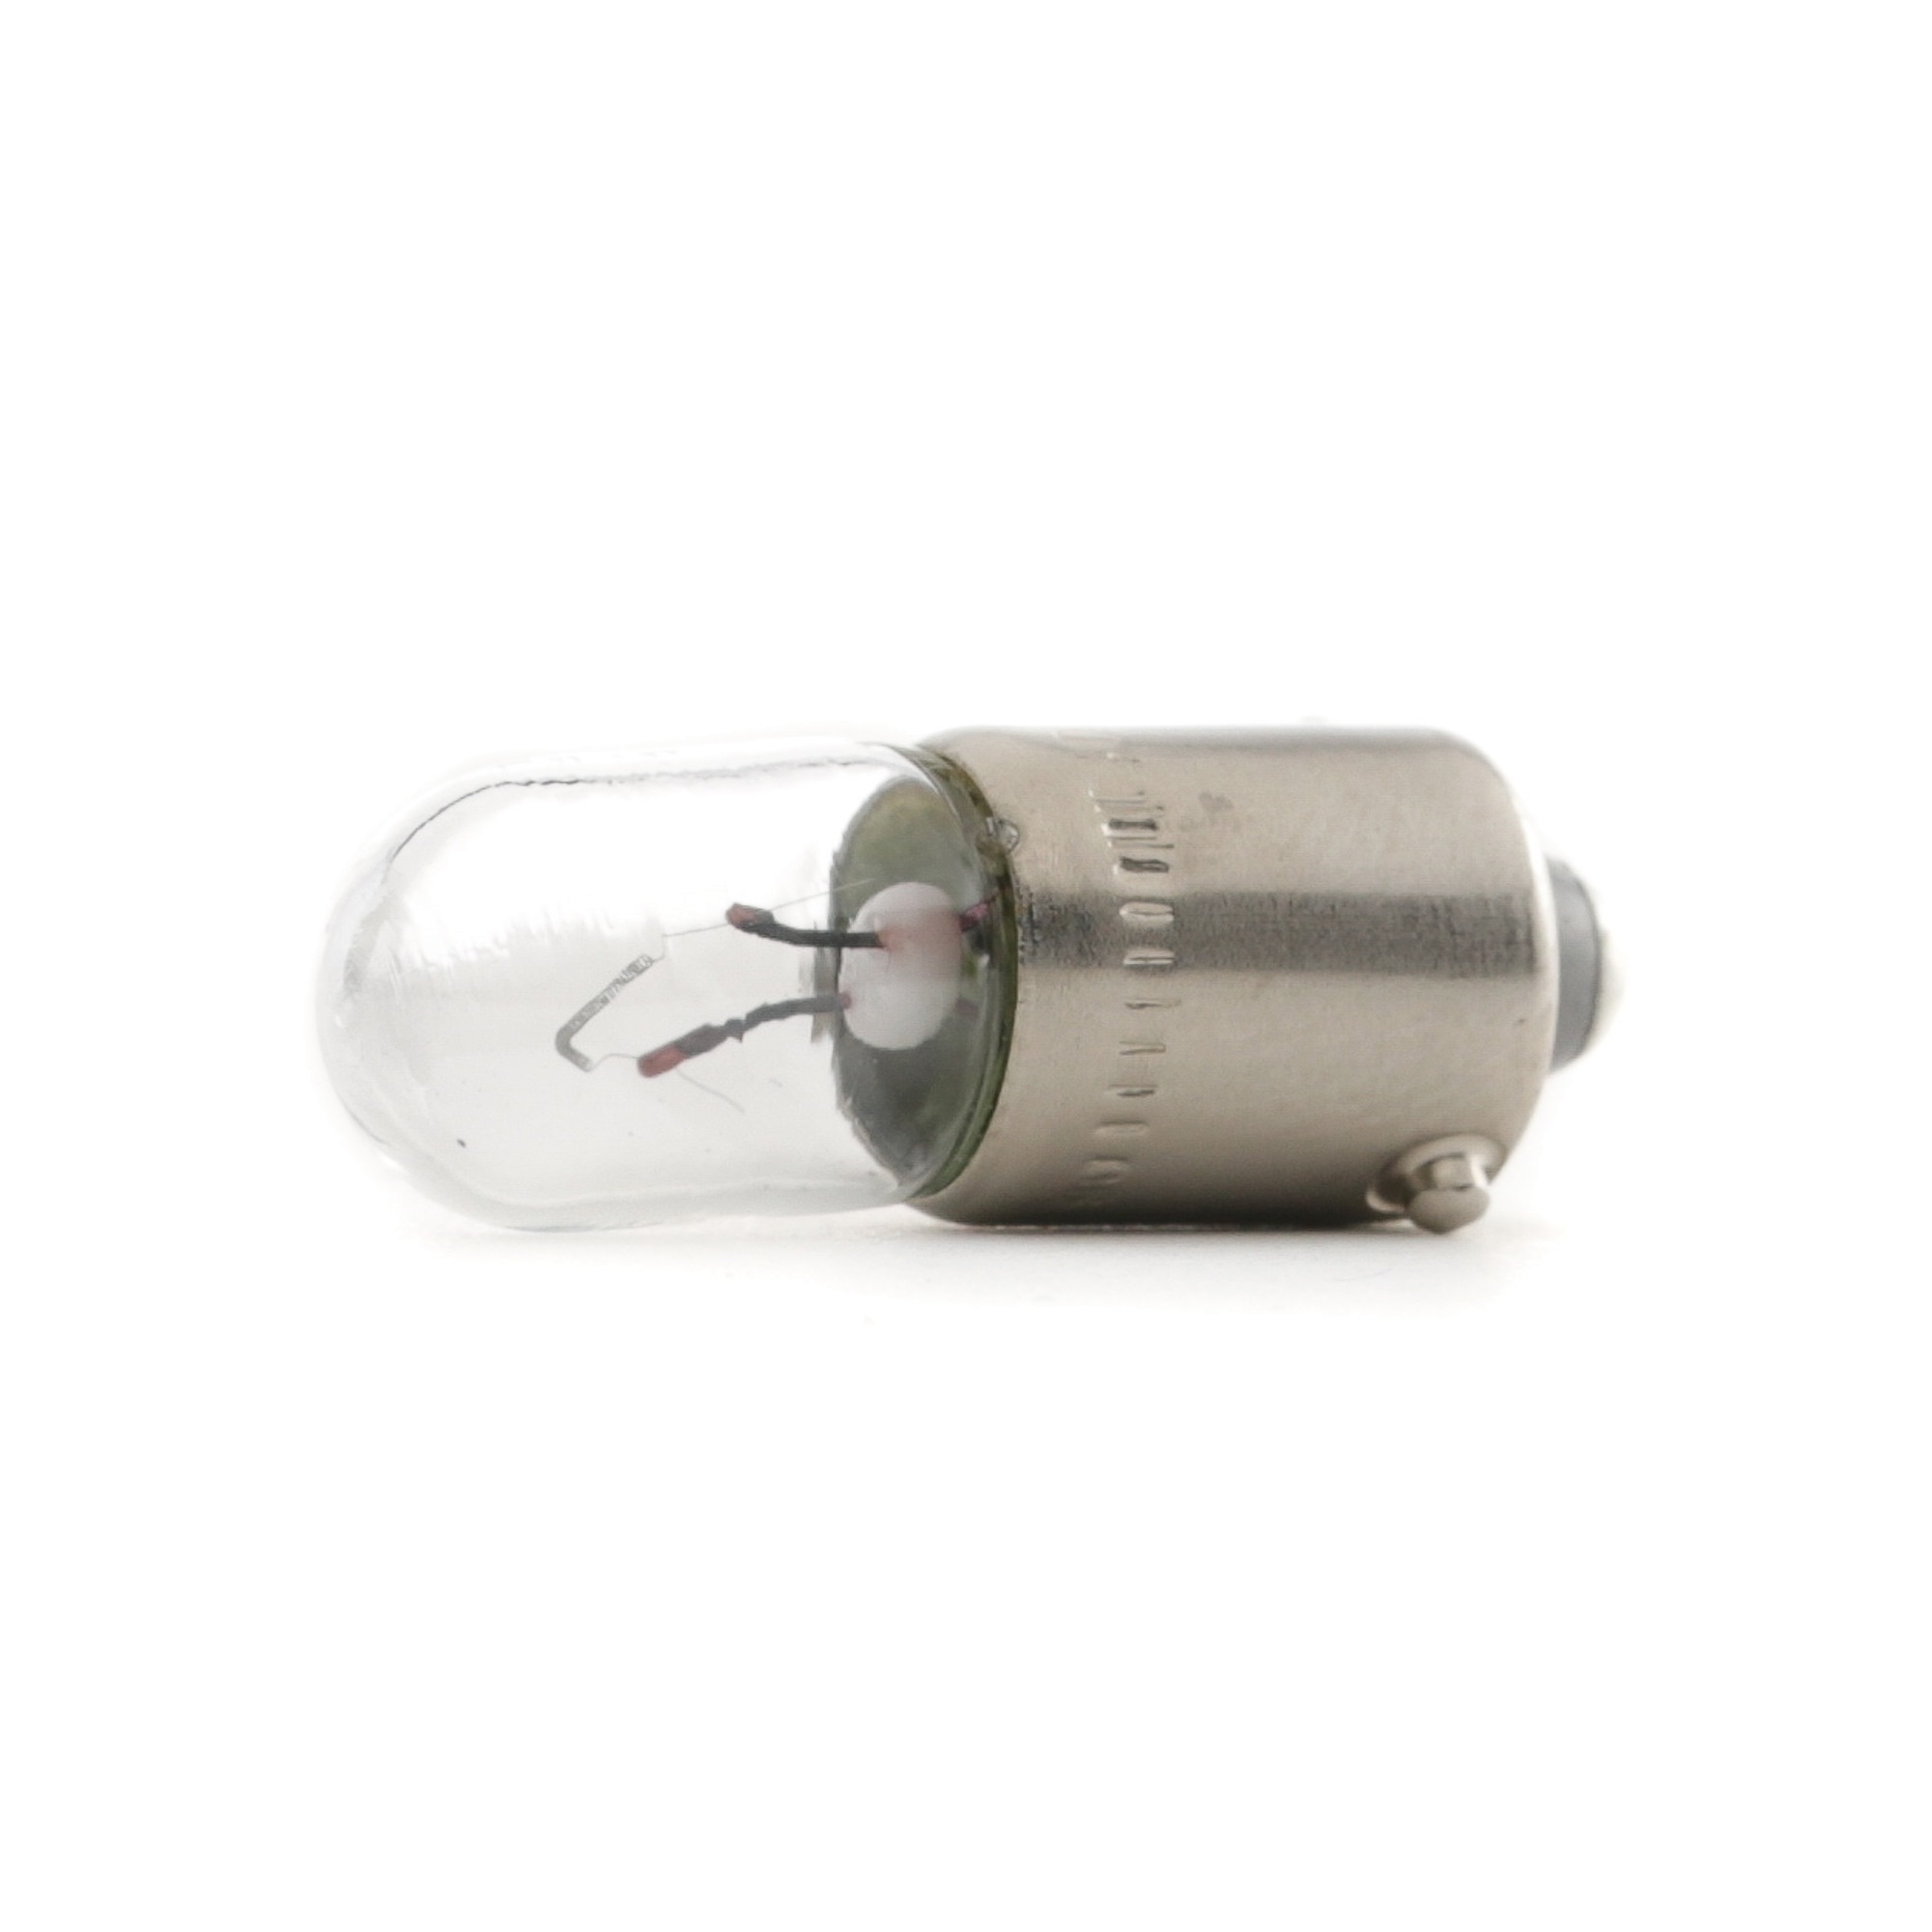 OSRAM ORIGINAL Glödlampa, blinker T4W, BA9s, 12V, 4W 3893 SUZUKI